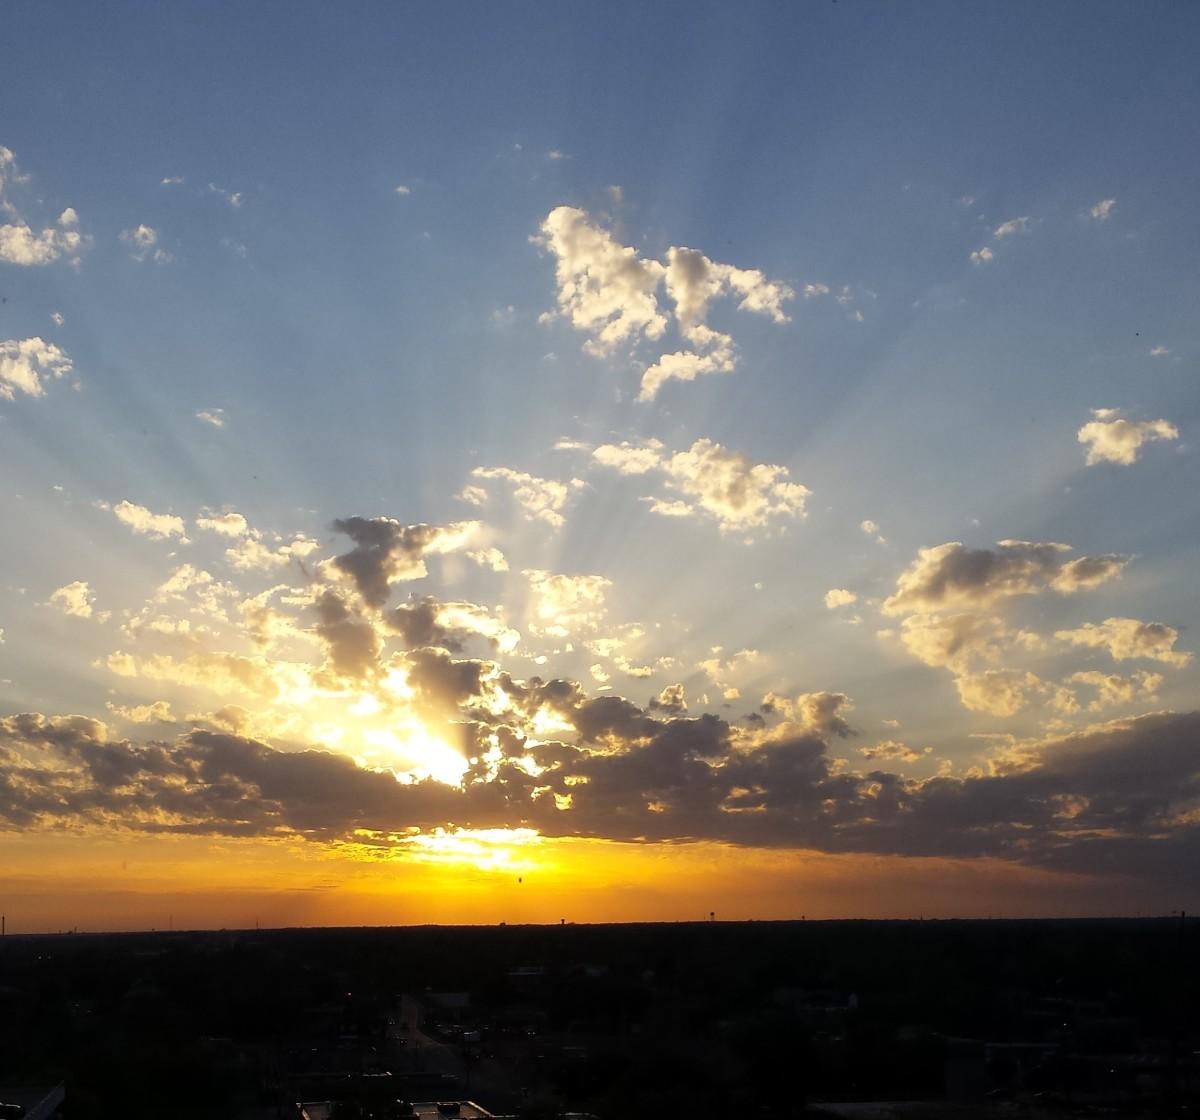 Brighter tomorrows in our dreams...